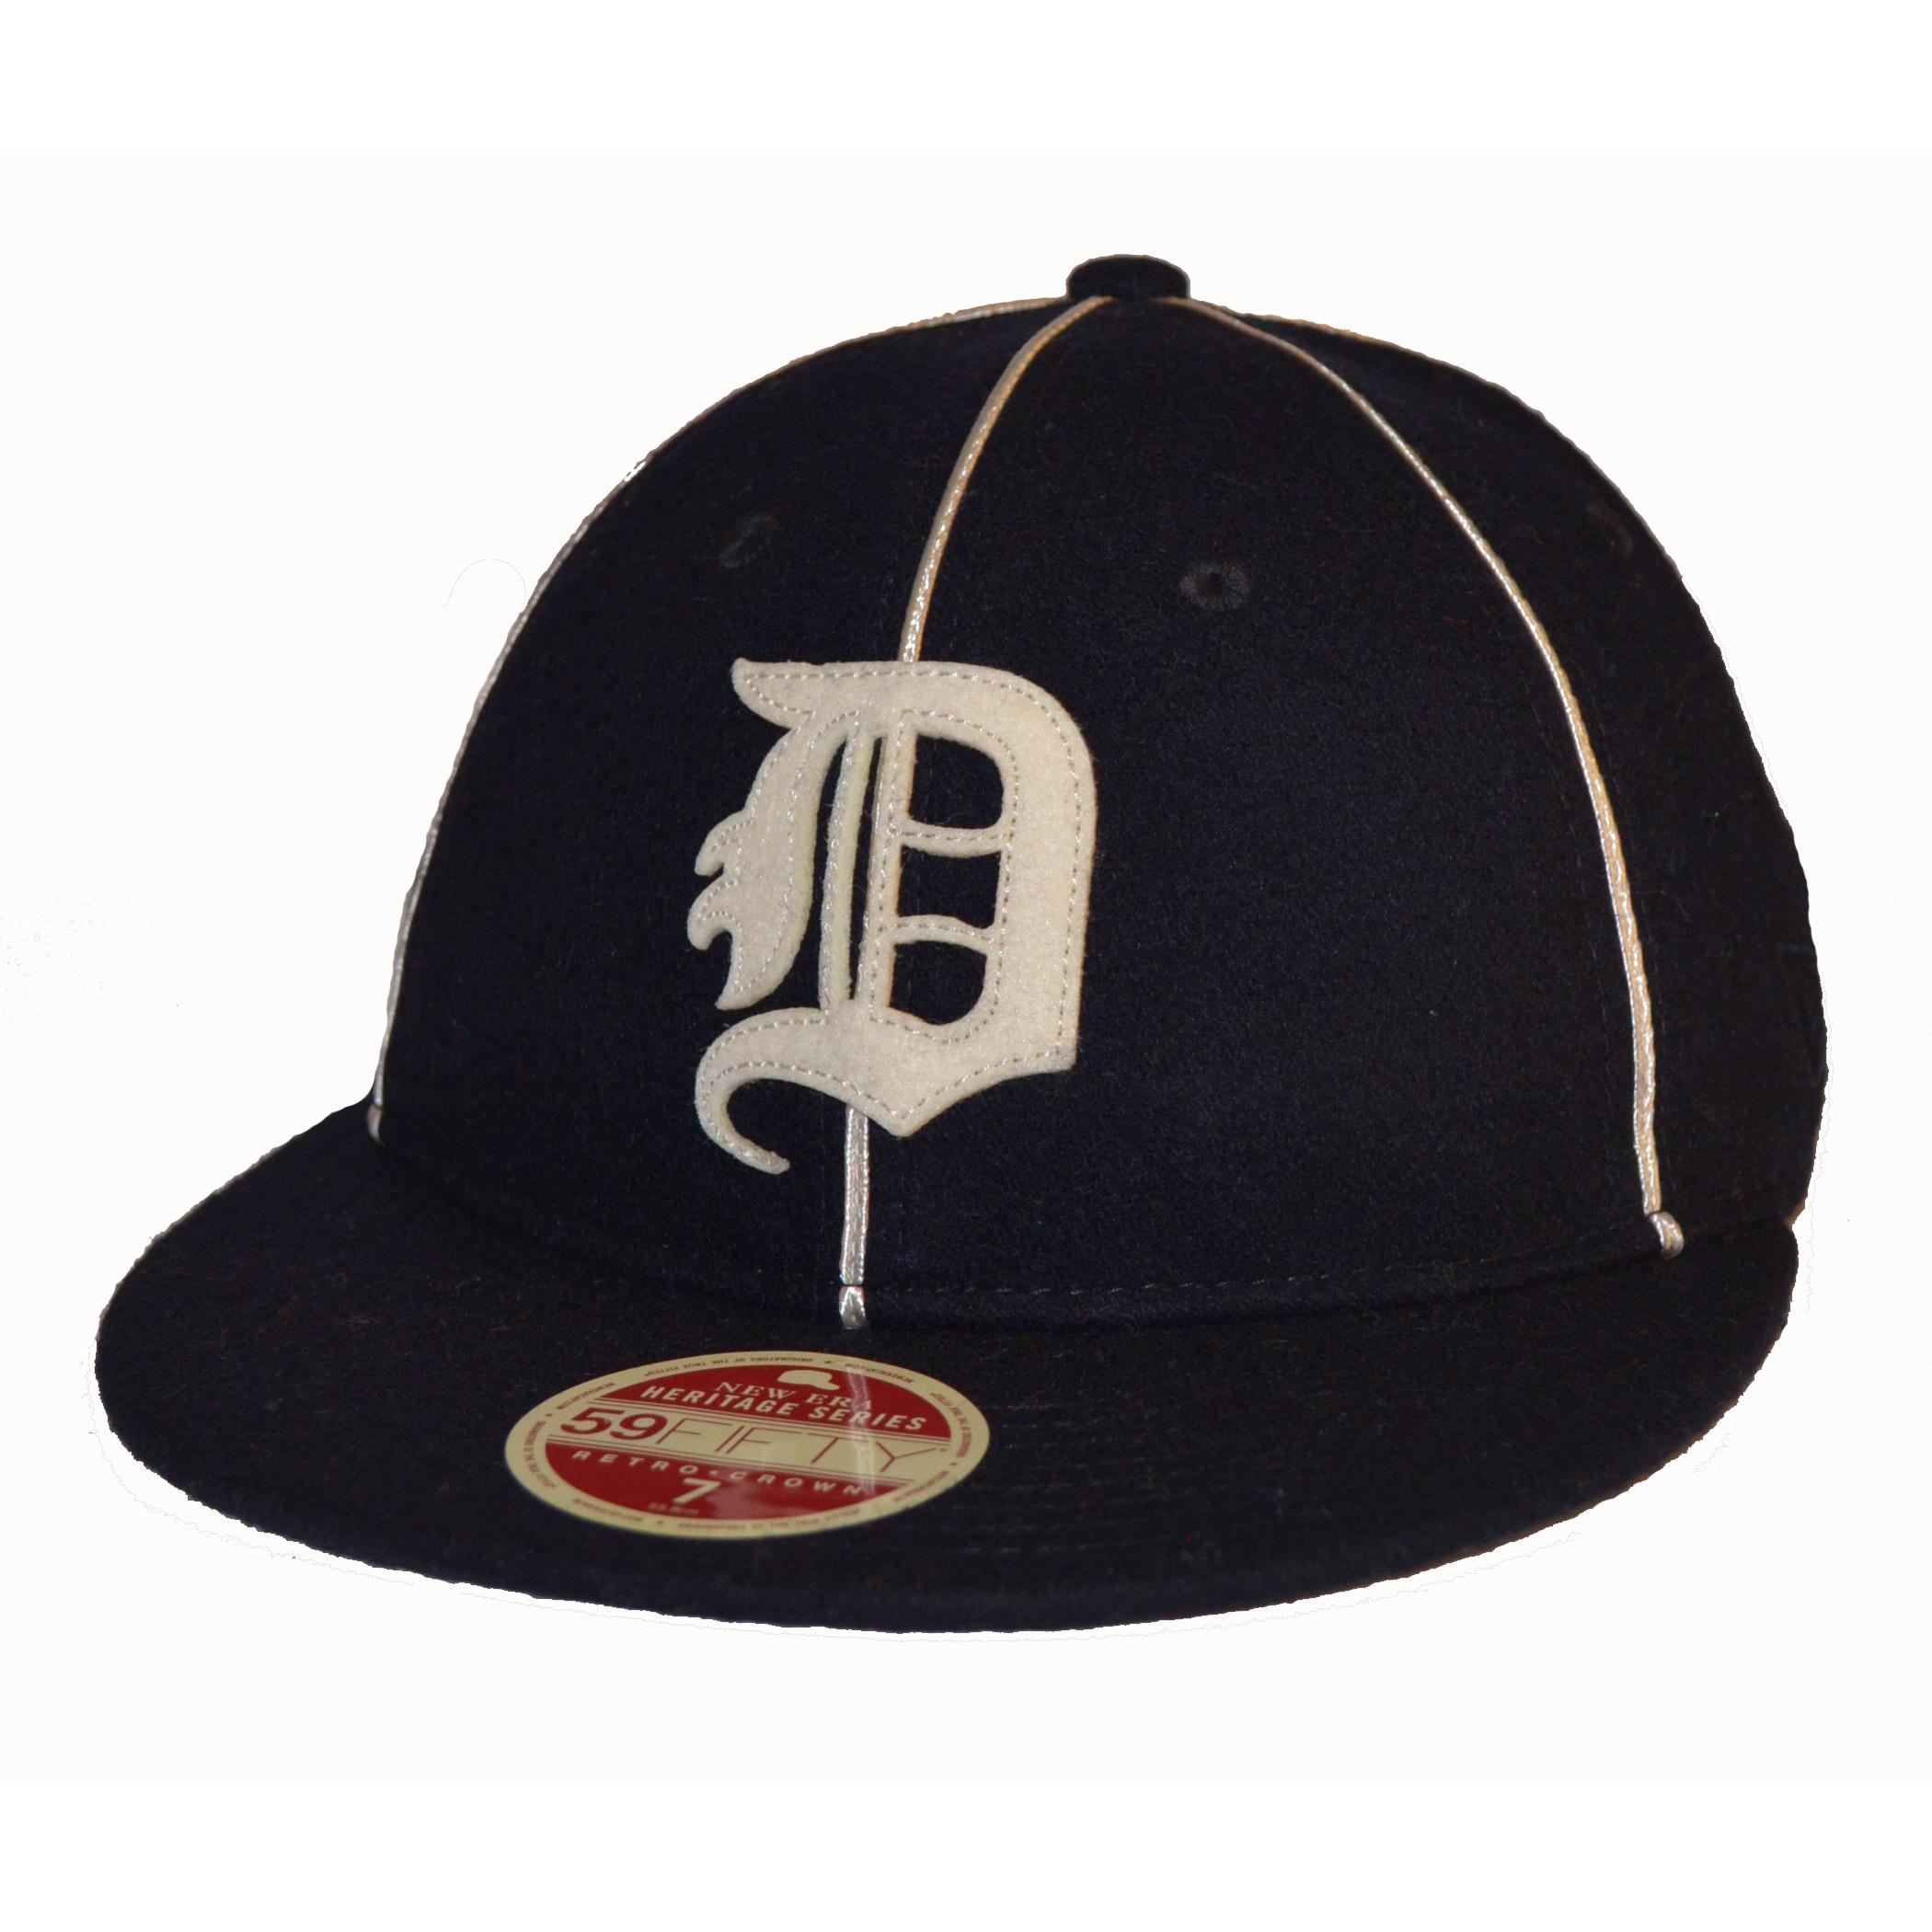 best loved 524d2 4f089 Detroit Tigers 1914 Heritage Series